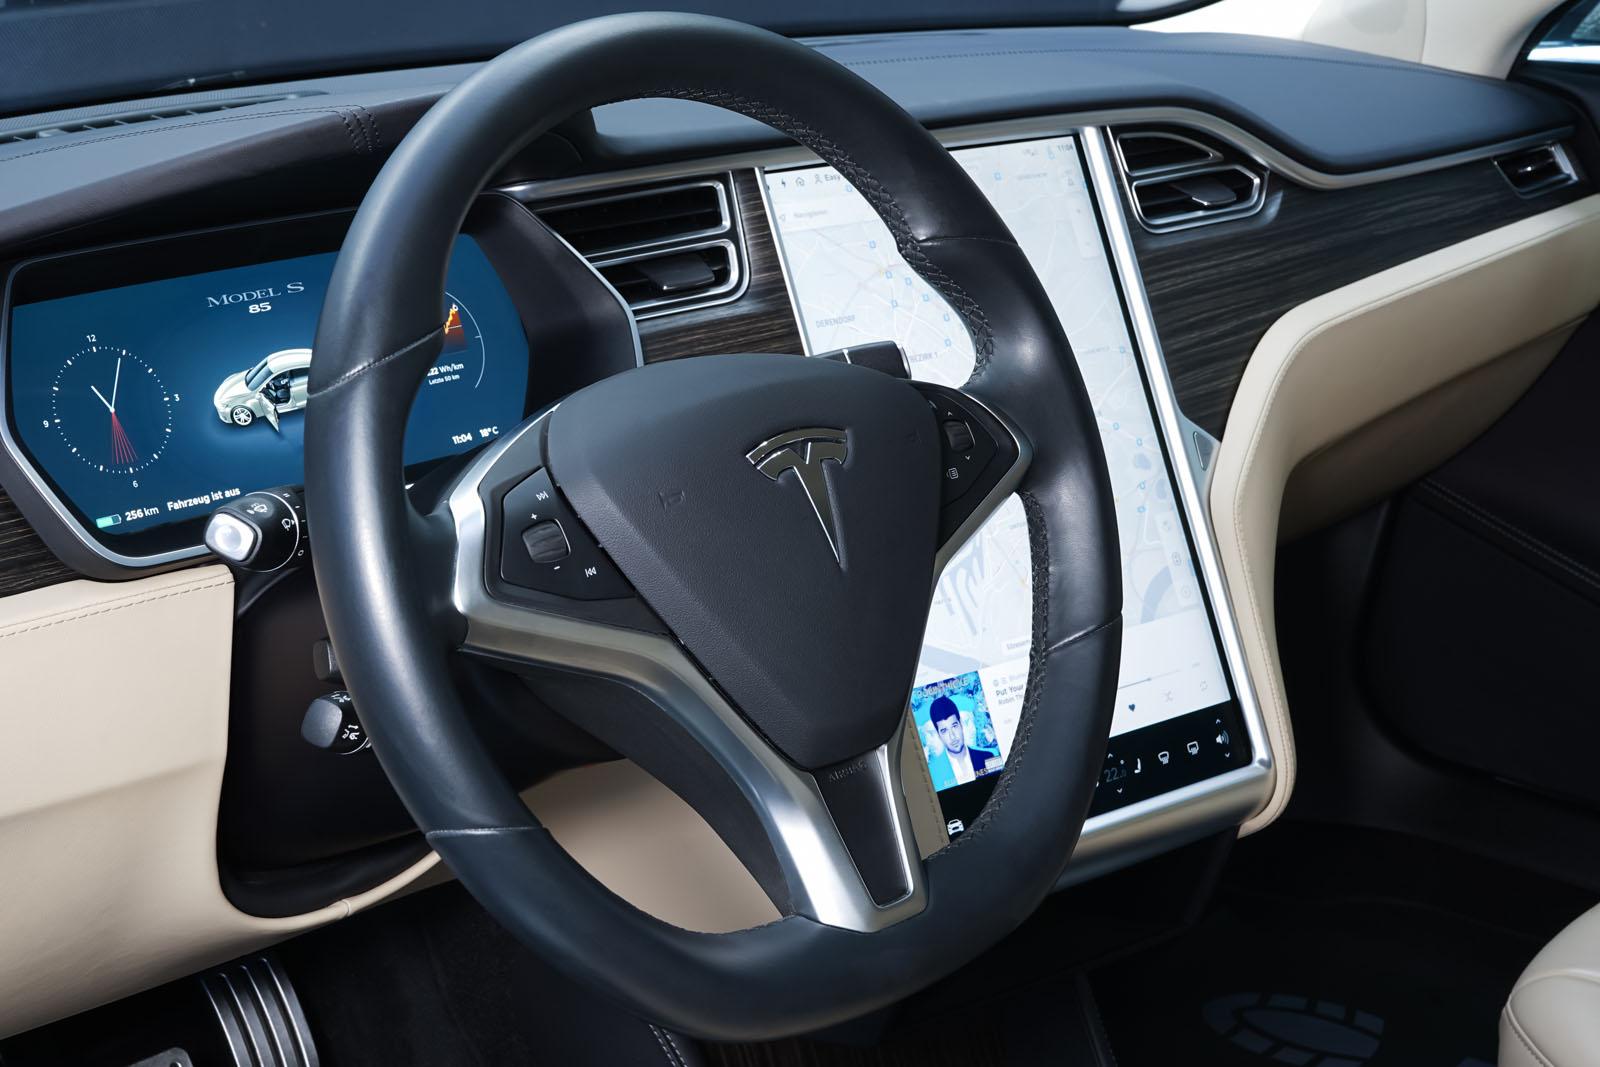 Tesla_ModelS85D_TitaniumMetallic_Beige_Tes-2897_10_w